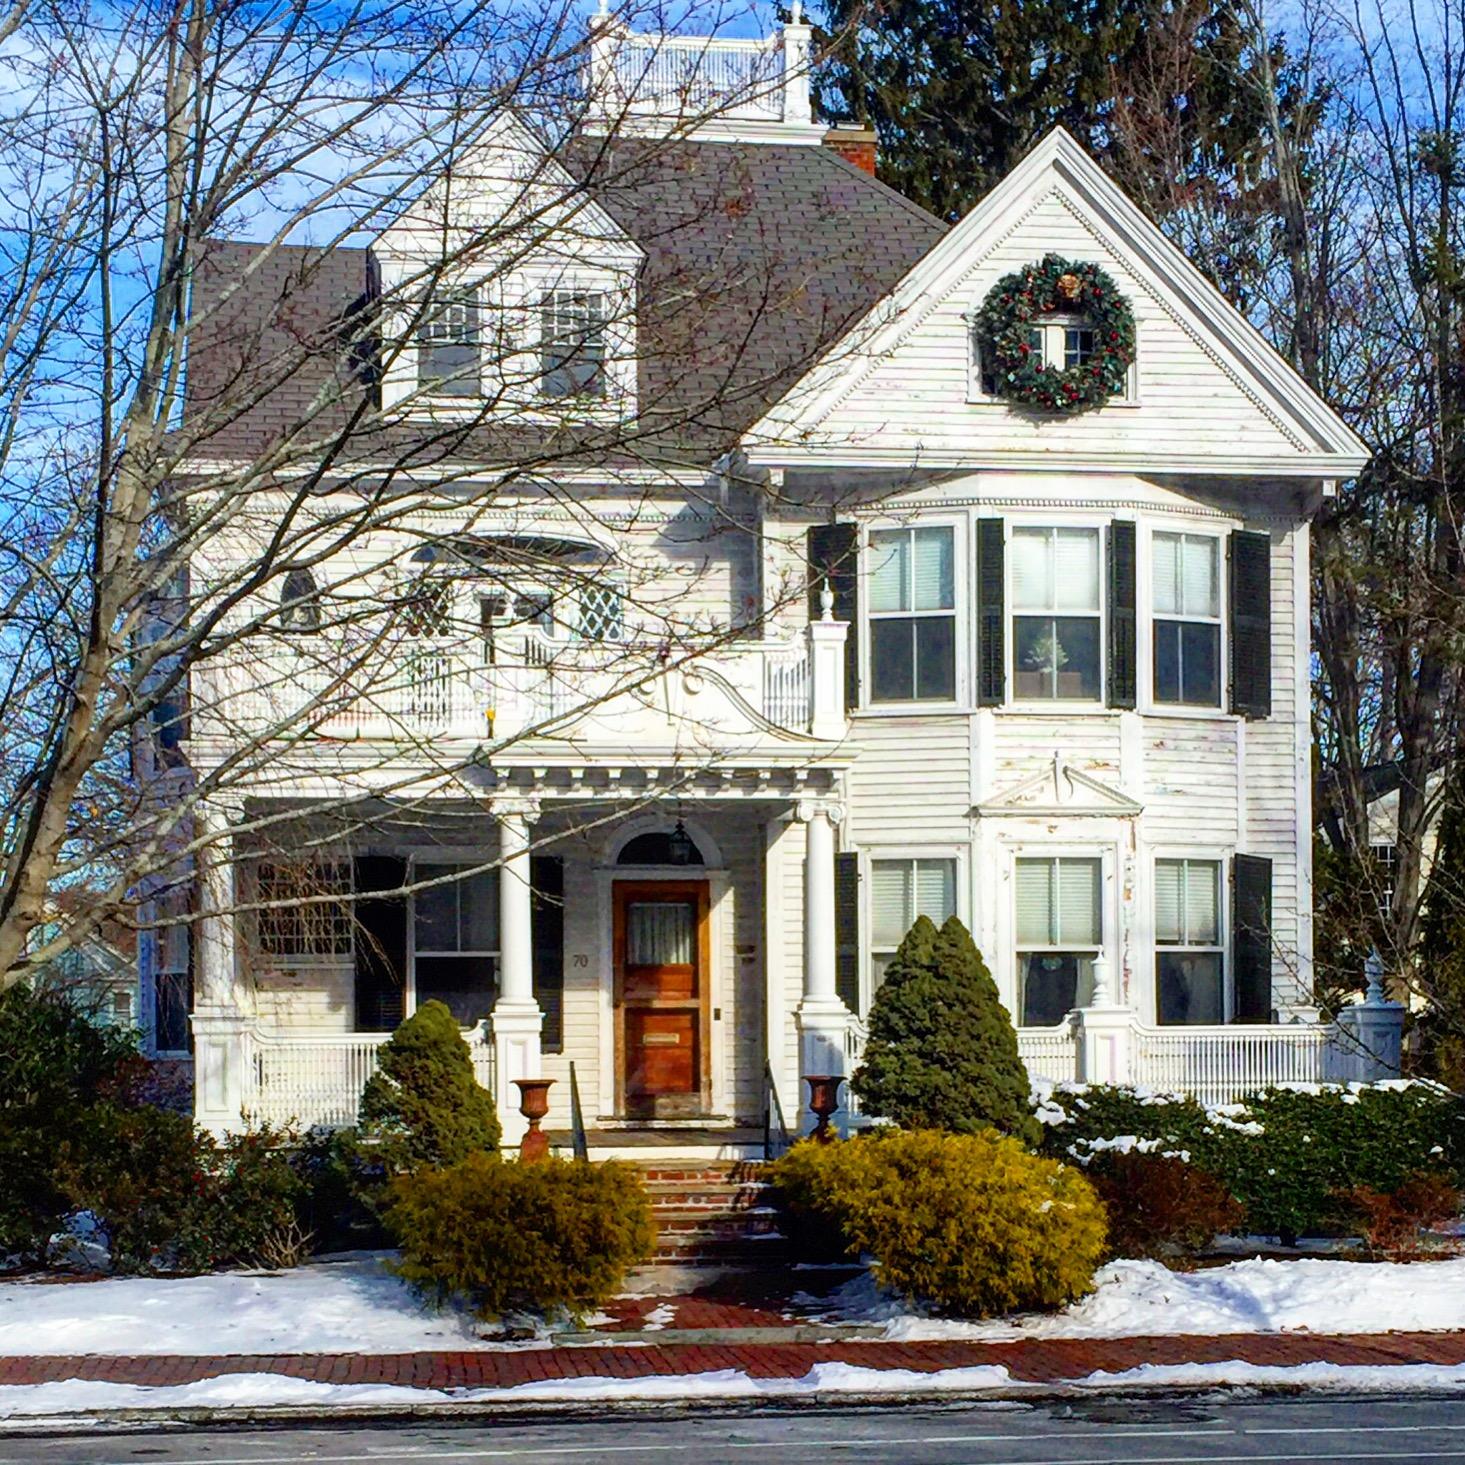 white victorian white trim black shutters red door Newburyport MA New England USA.jpg